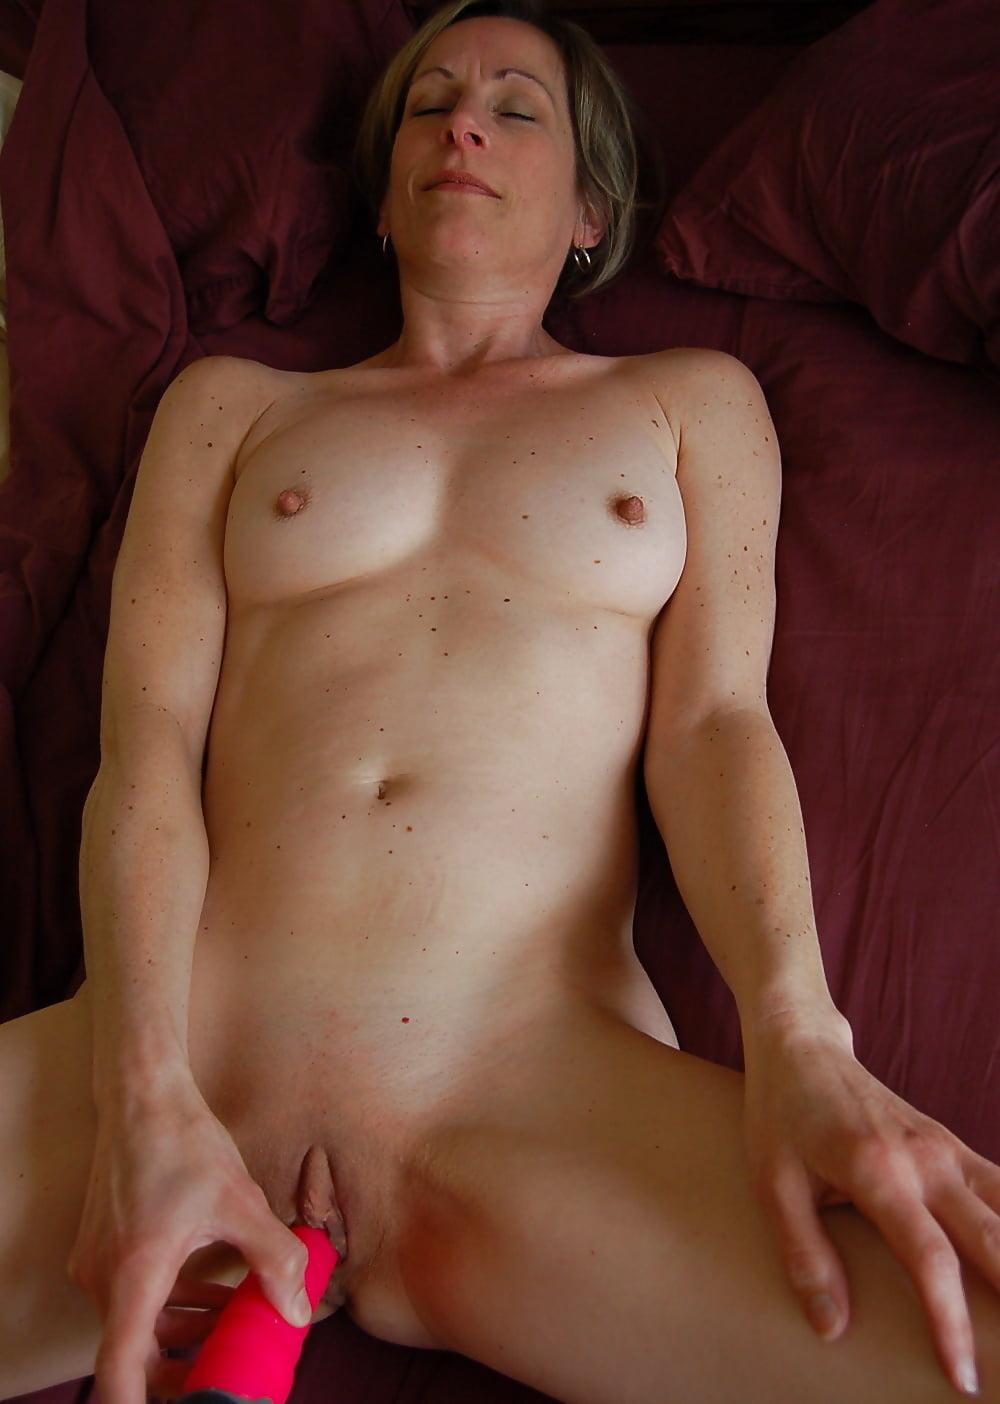 Masturbating nude mature women